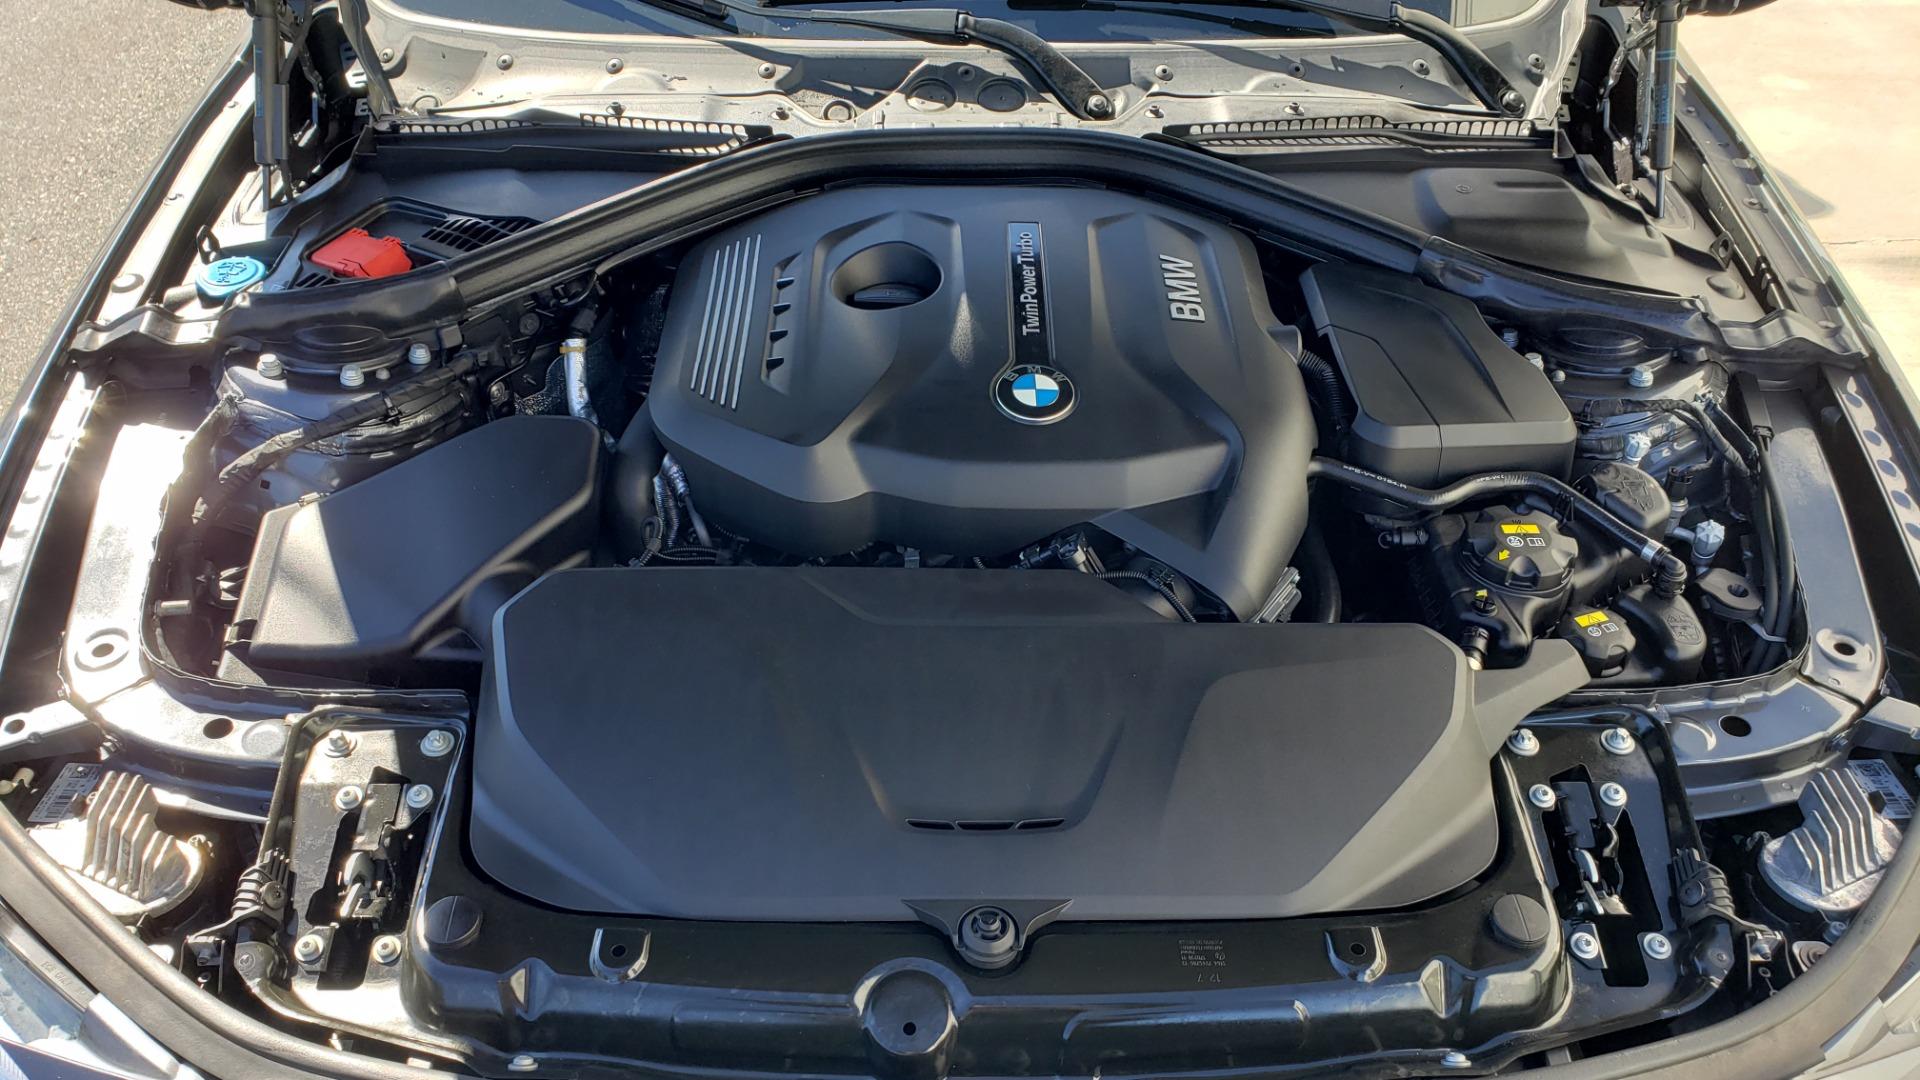 Used 2018 BMW 4 SERIES 430IXDRIVE / PREMIUM / NAV / SUNROOF / ESSENTIALS PKG for sale $29,495 at Formula Imports in Charlotte NC 28227 12